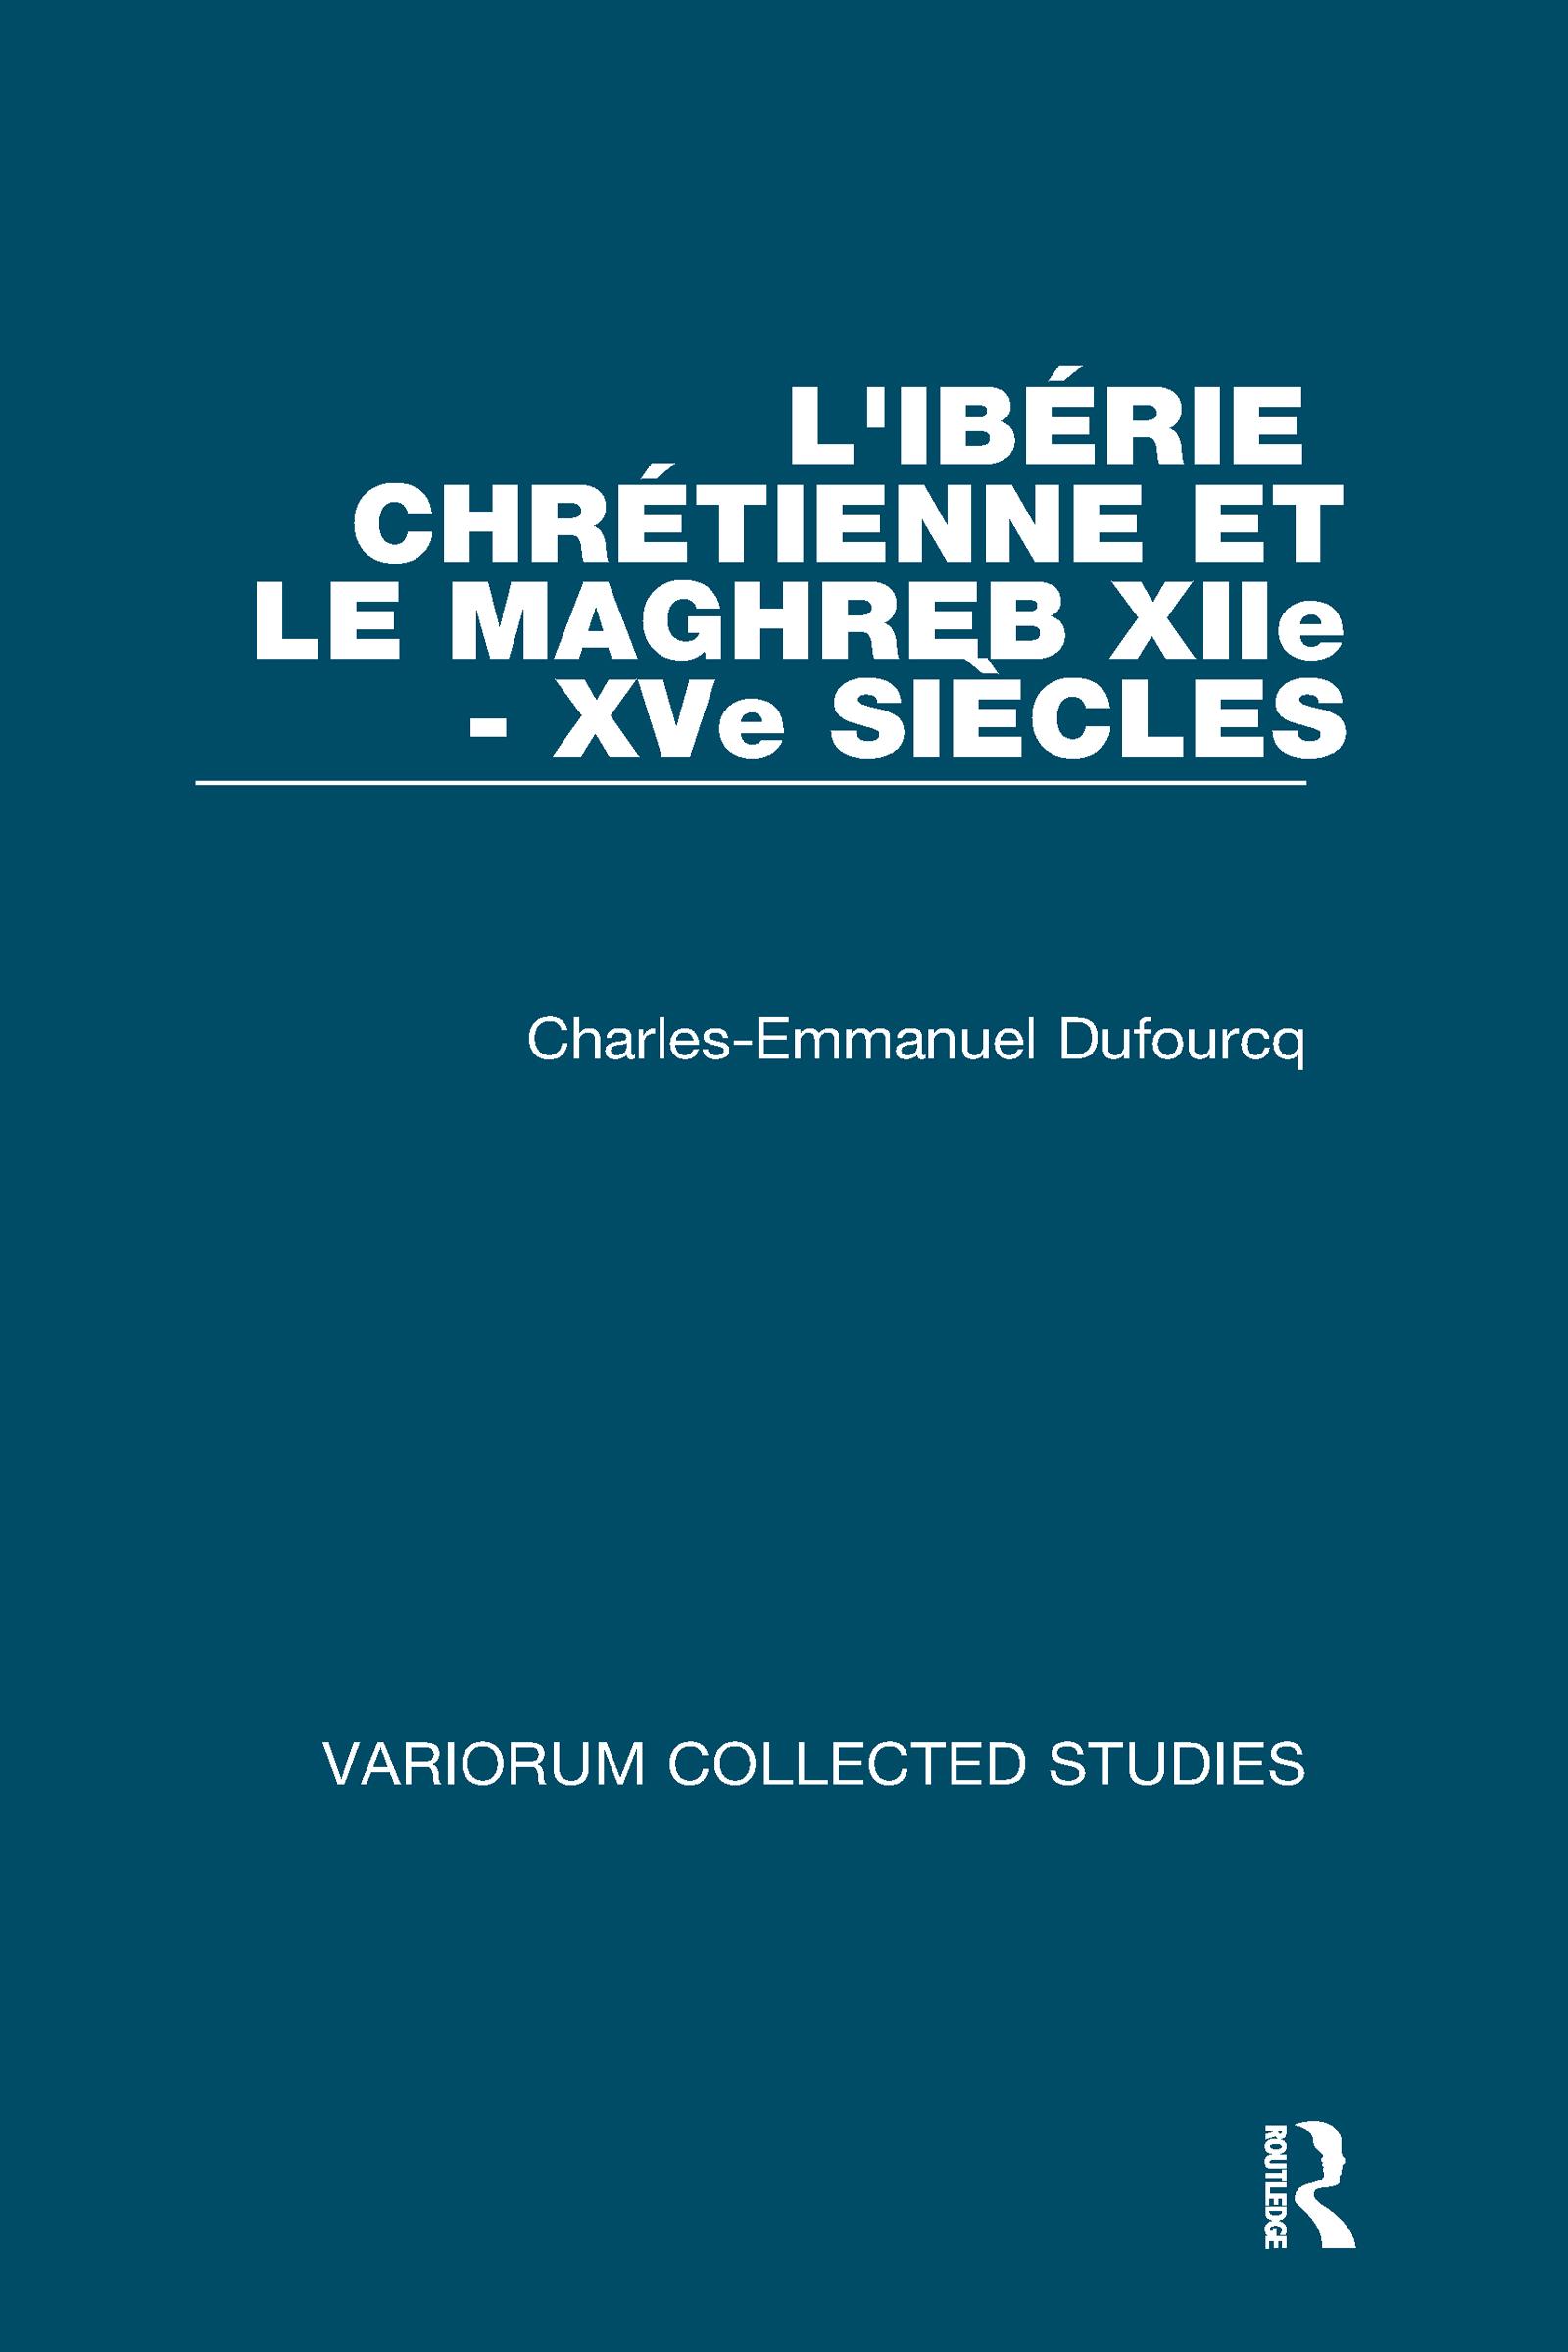 L'Ibérie Chrétienne et le Maghreb (XIIe - XVe siècles): 1st Edition (Hardback) book cover